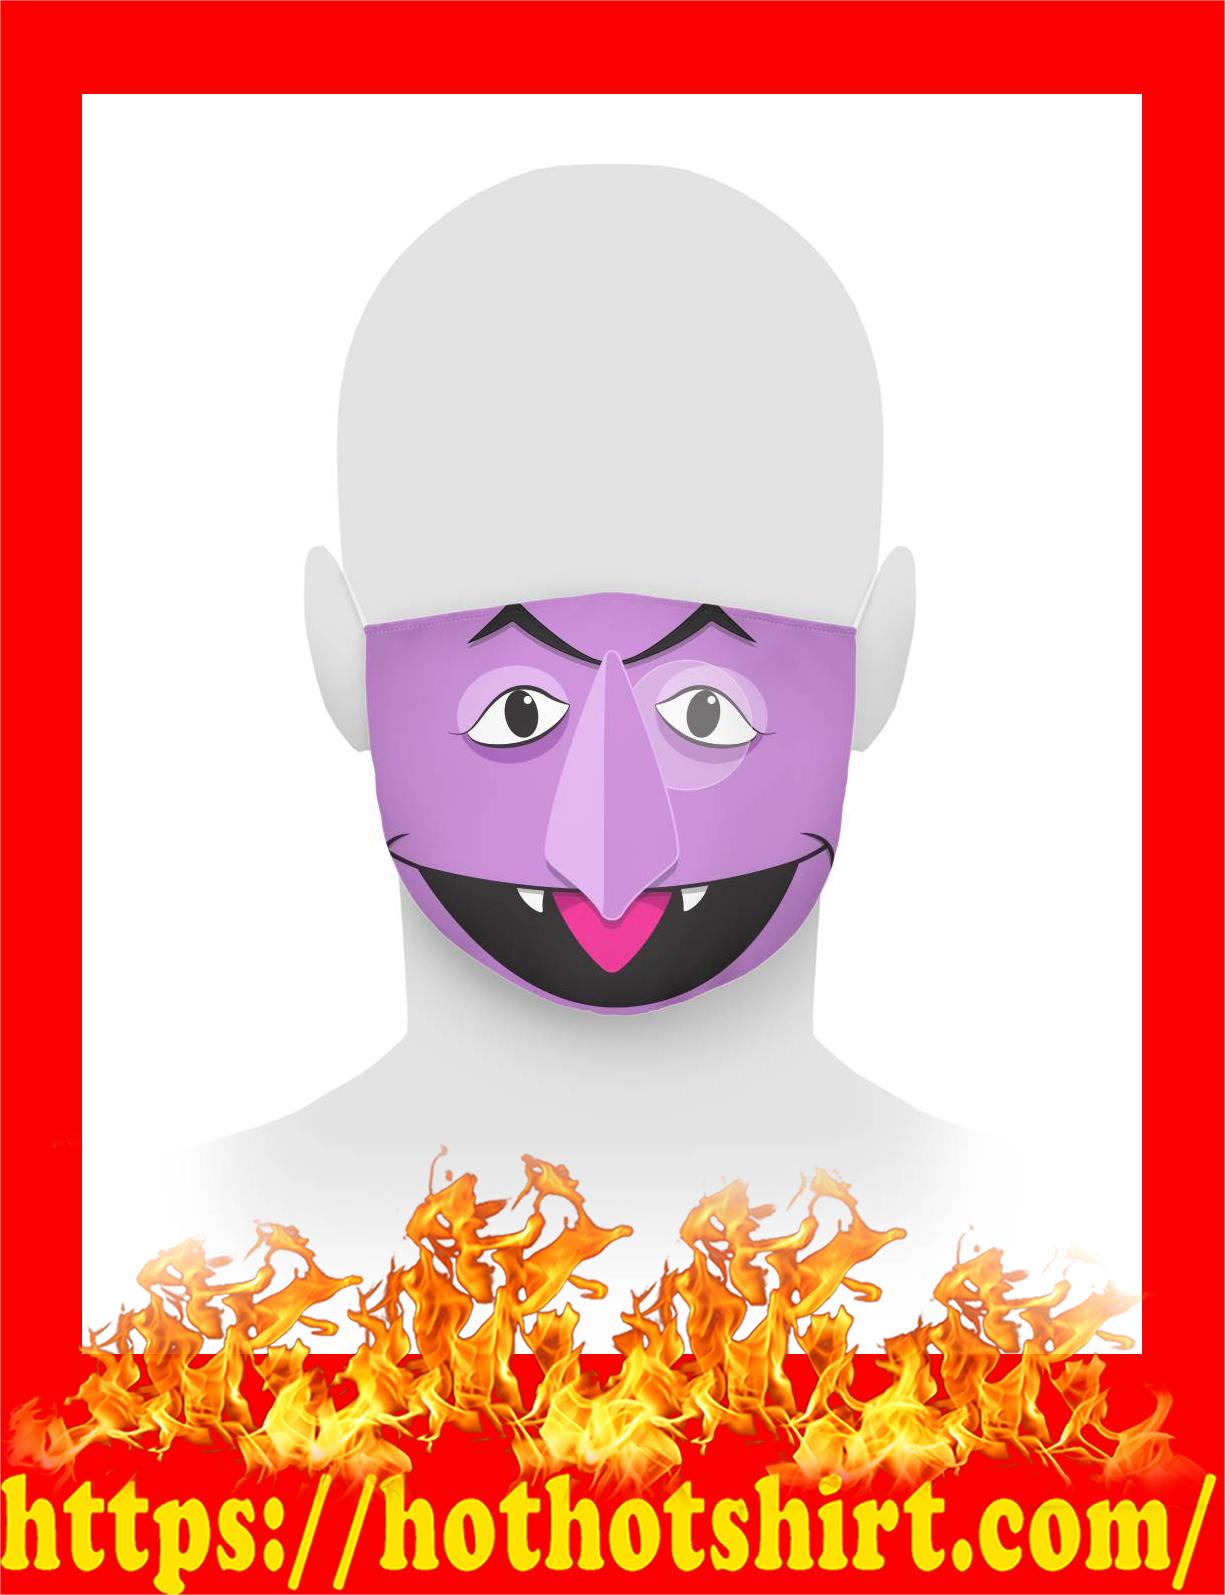 Count von count face mask - detail